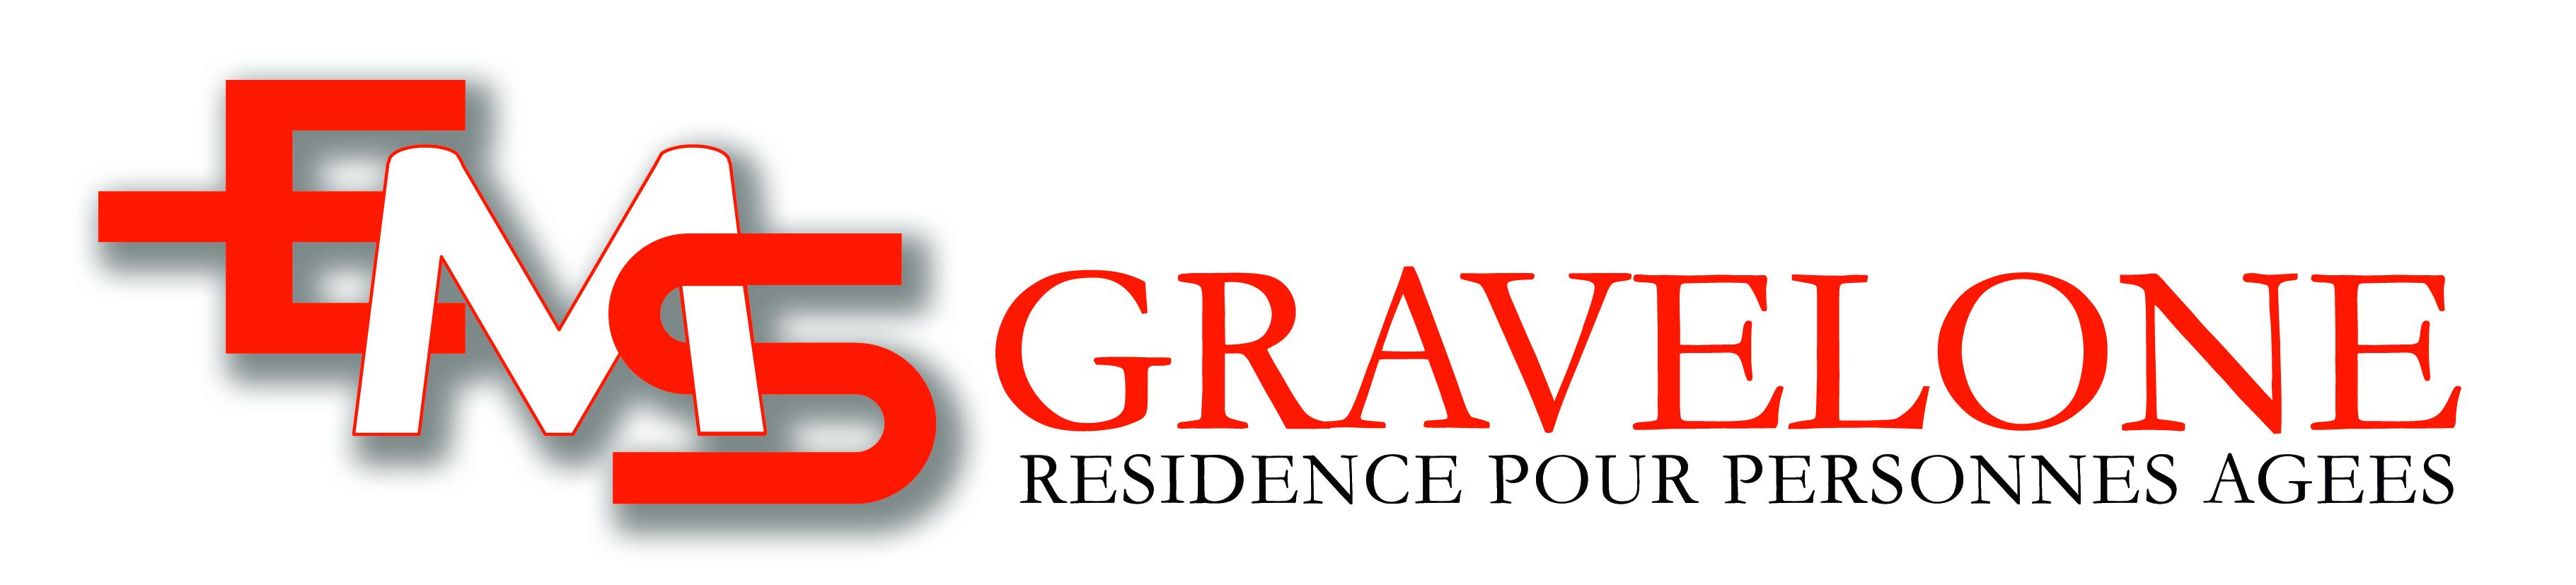 EMS Gravelone